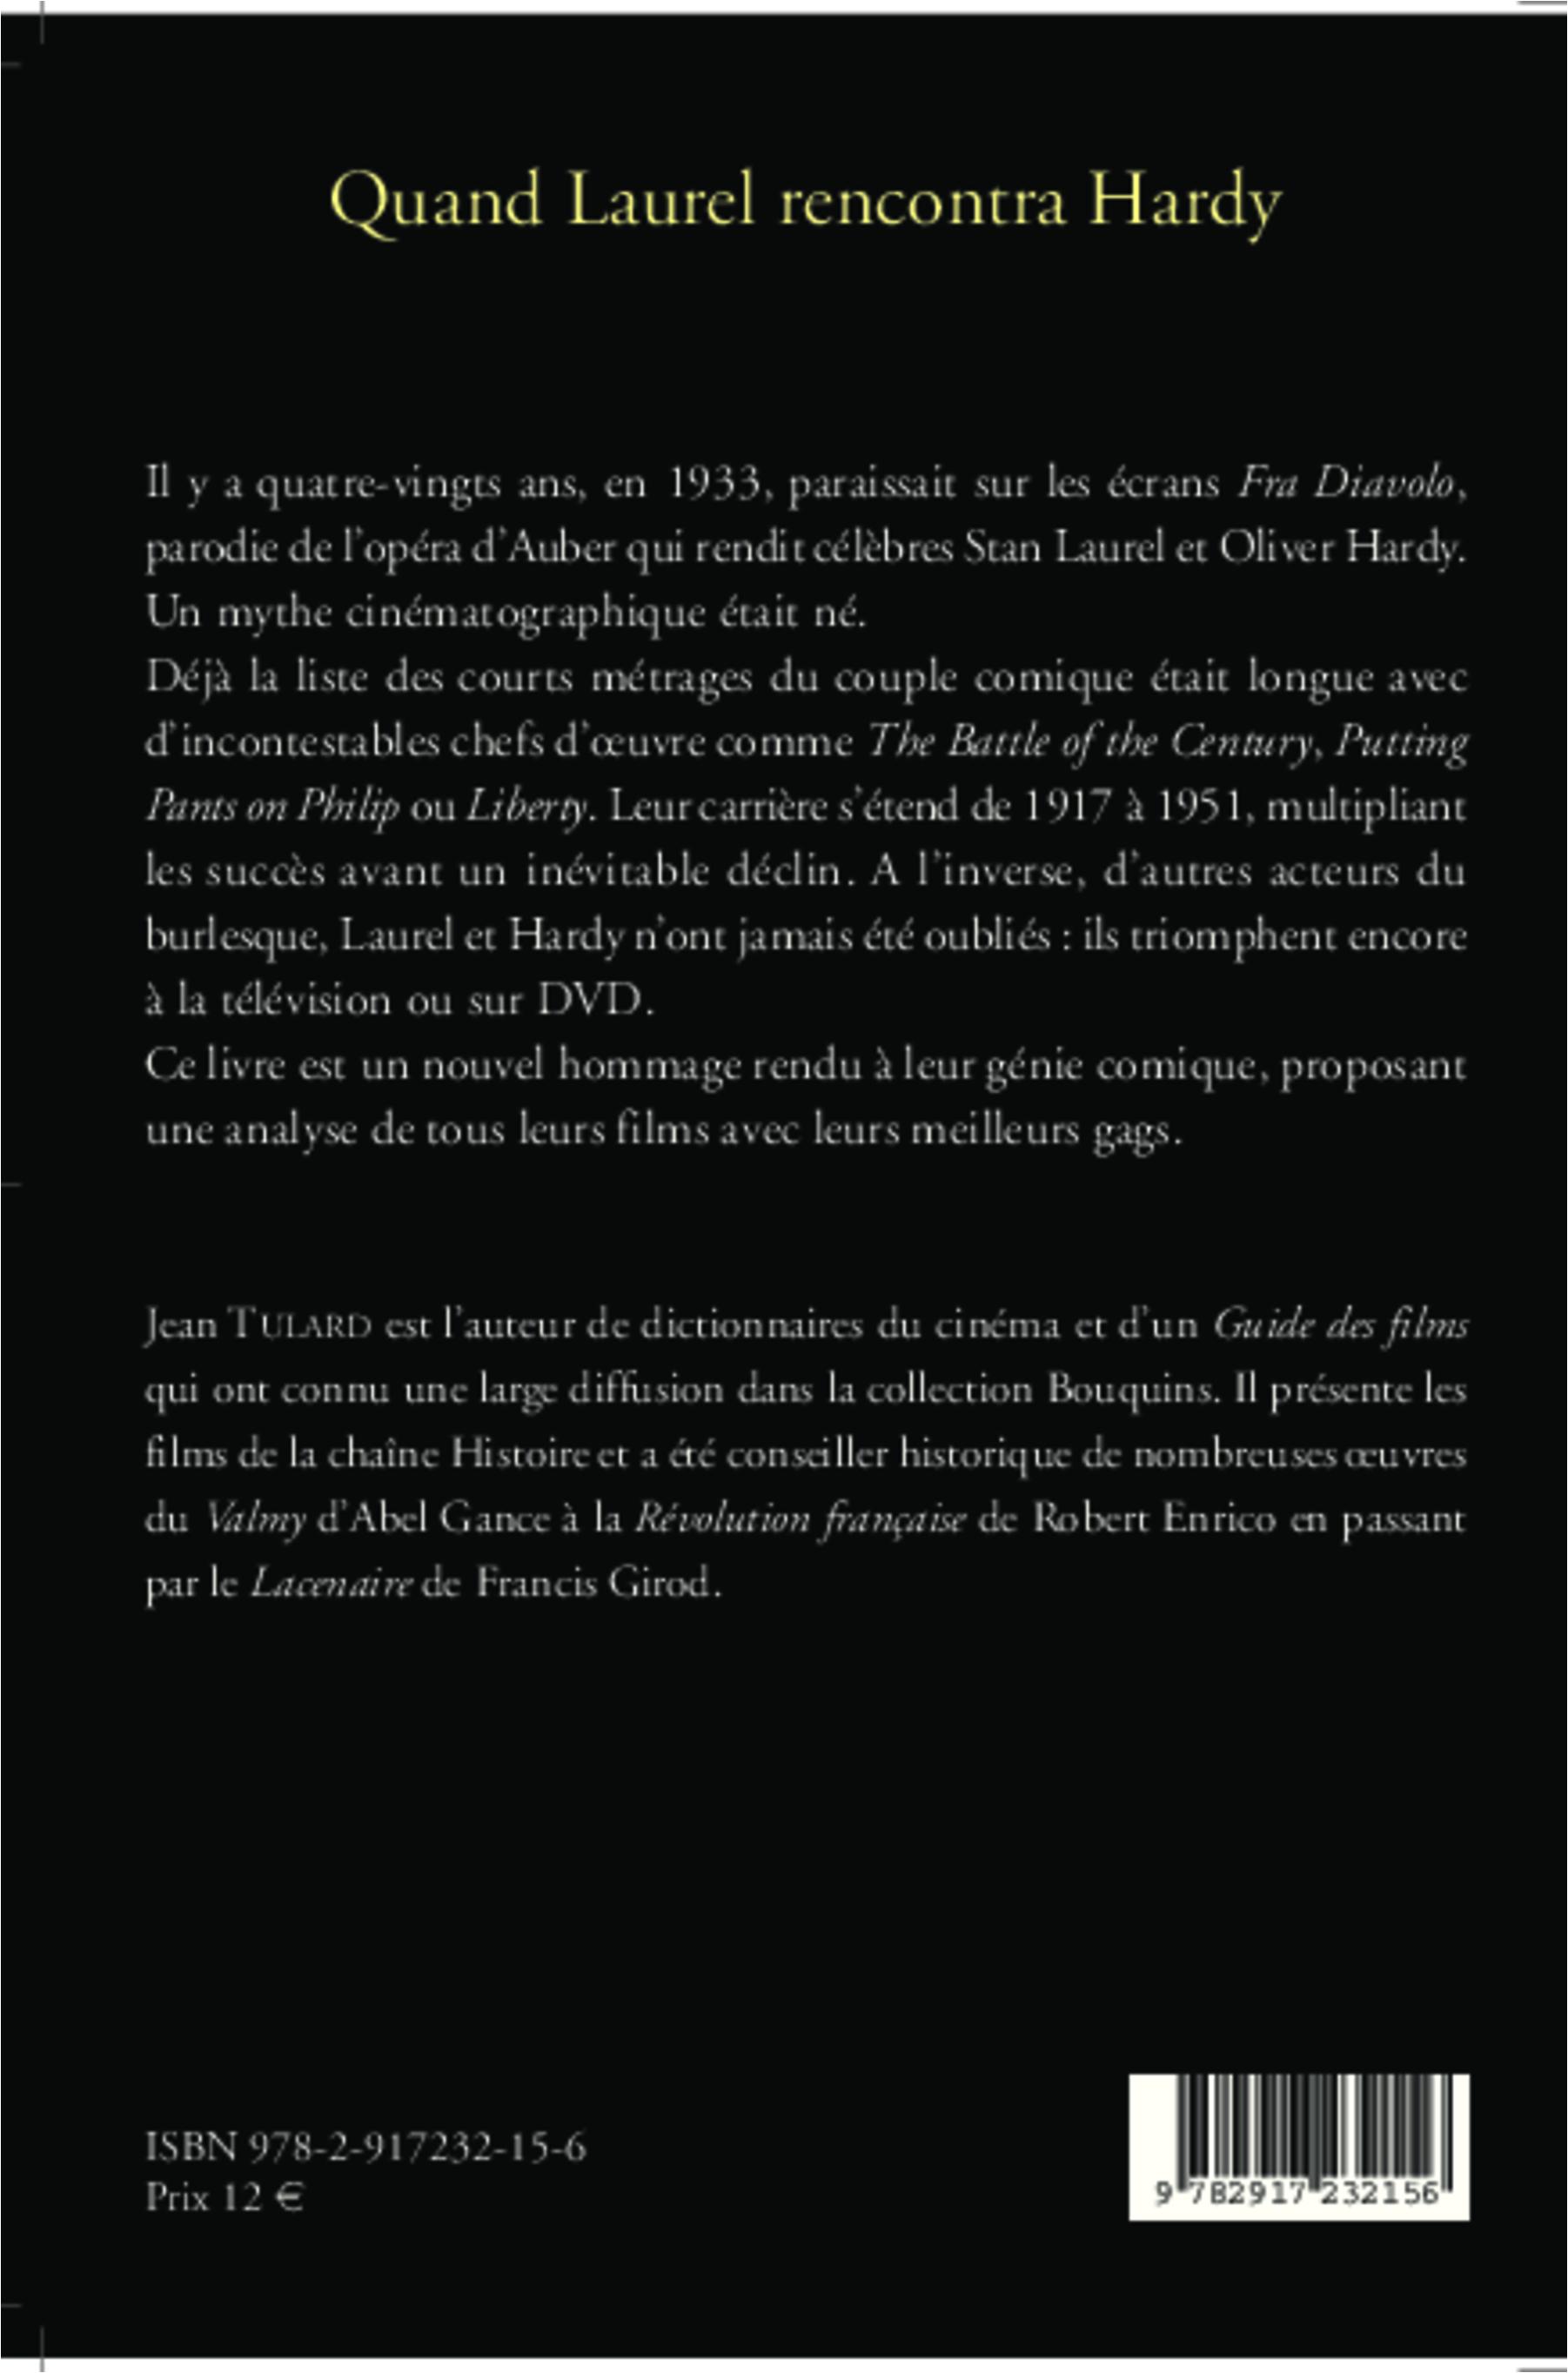 http://www.editions-harmattan.fr/catalogue/couv/9782917232156v.jpg